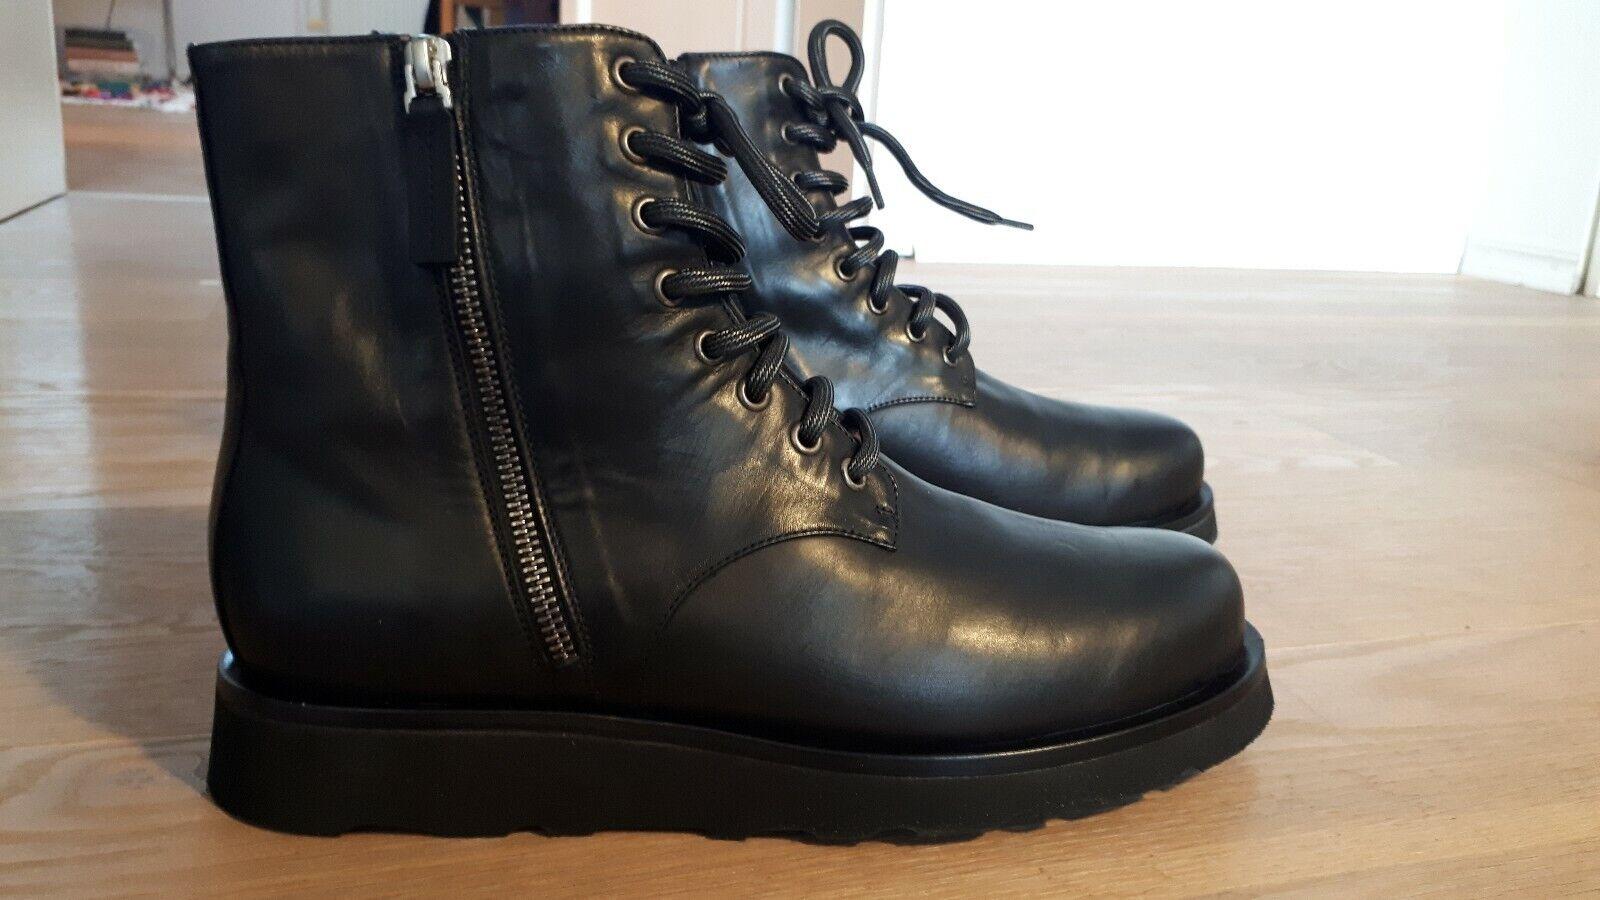 Stiefel Stiefel pomme d'or gr 41 Schwarz neu Neupreis 339eur, Modell norah